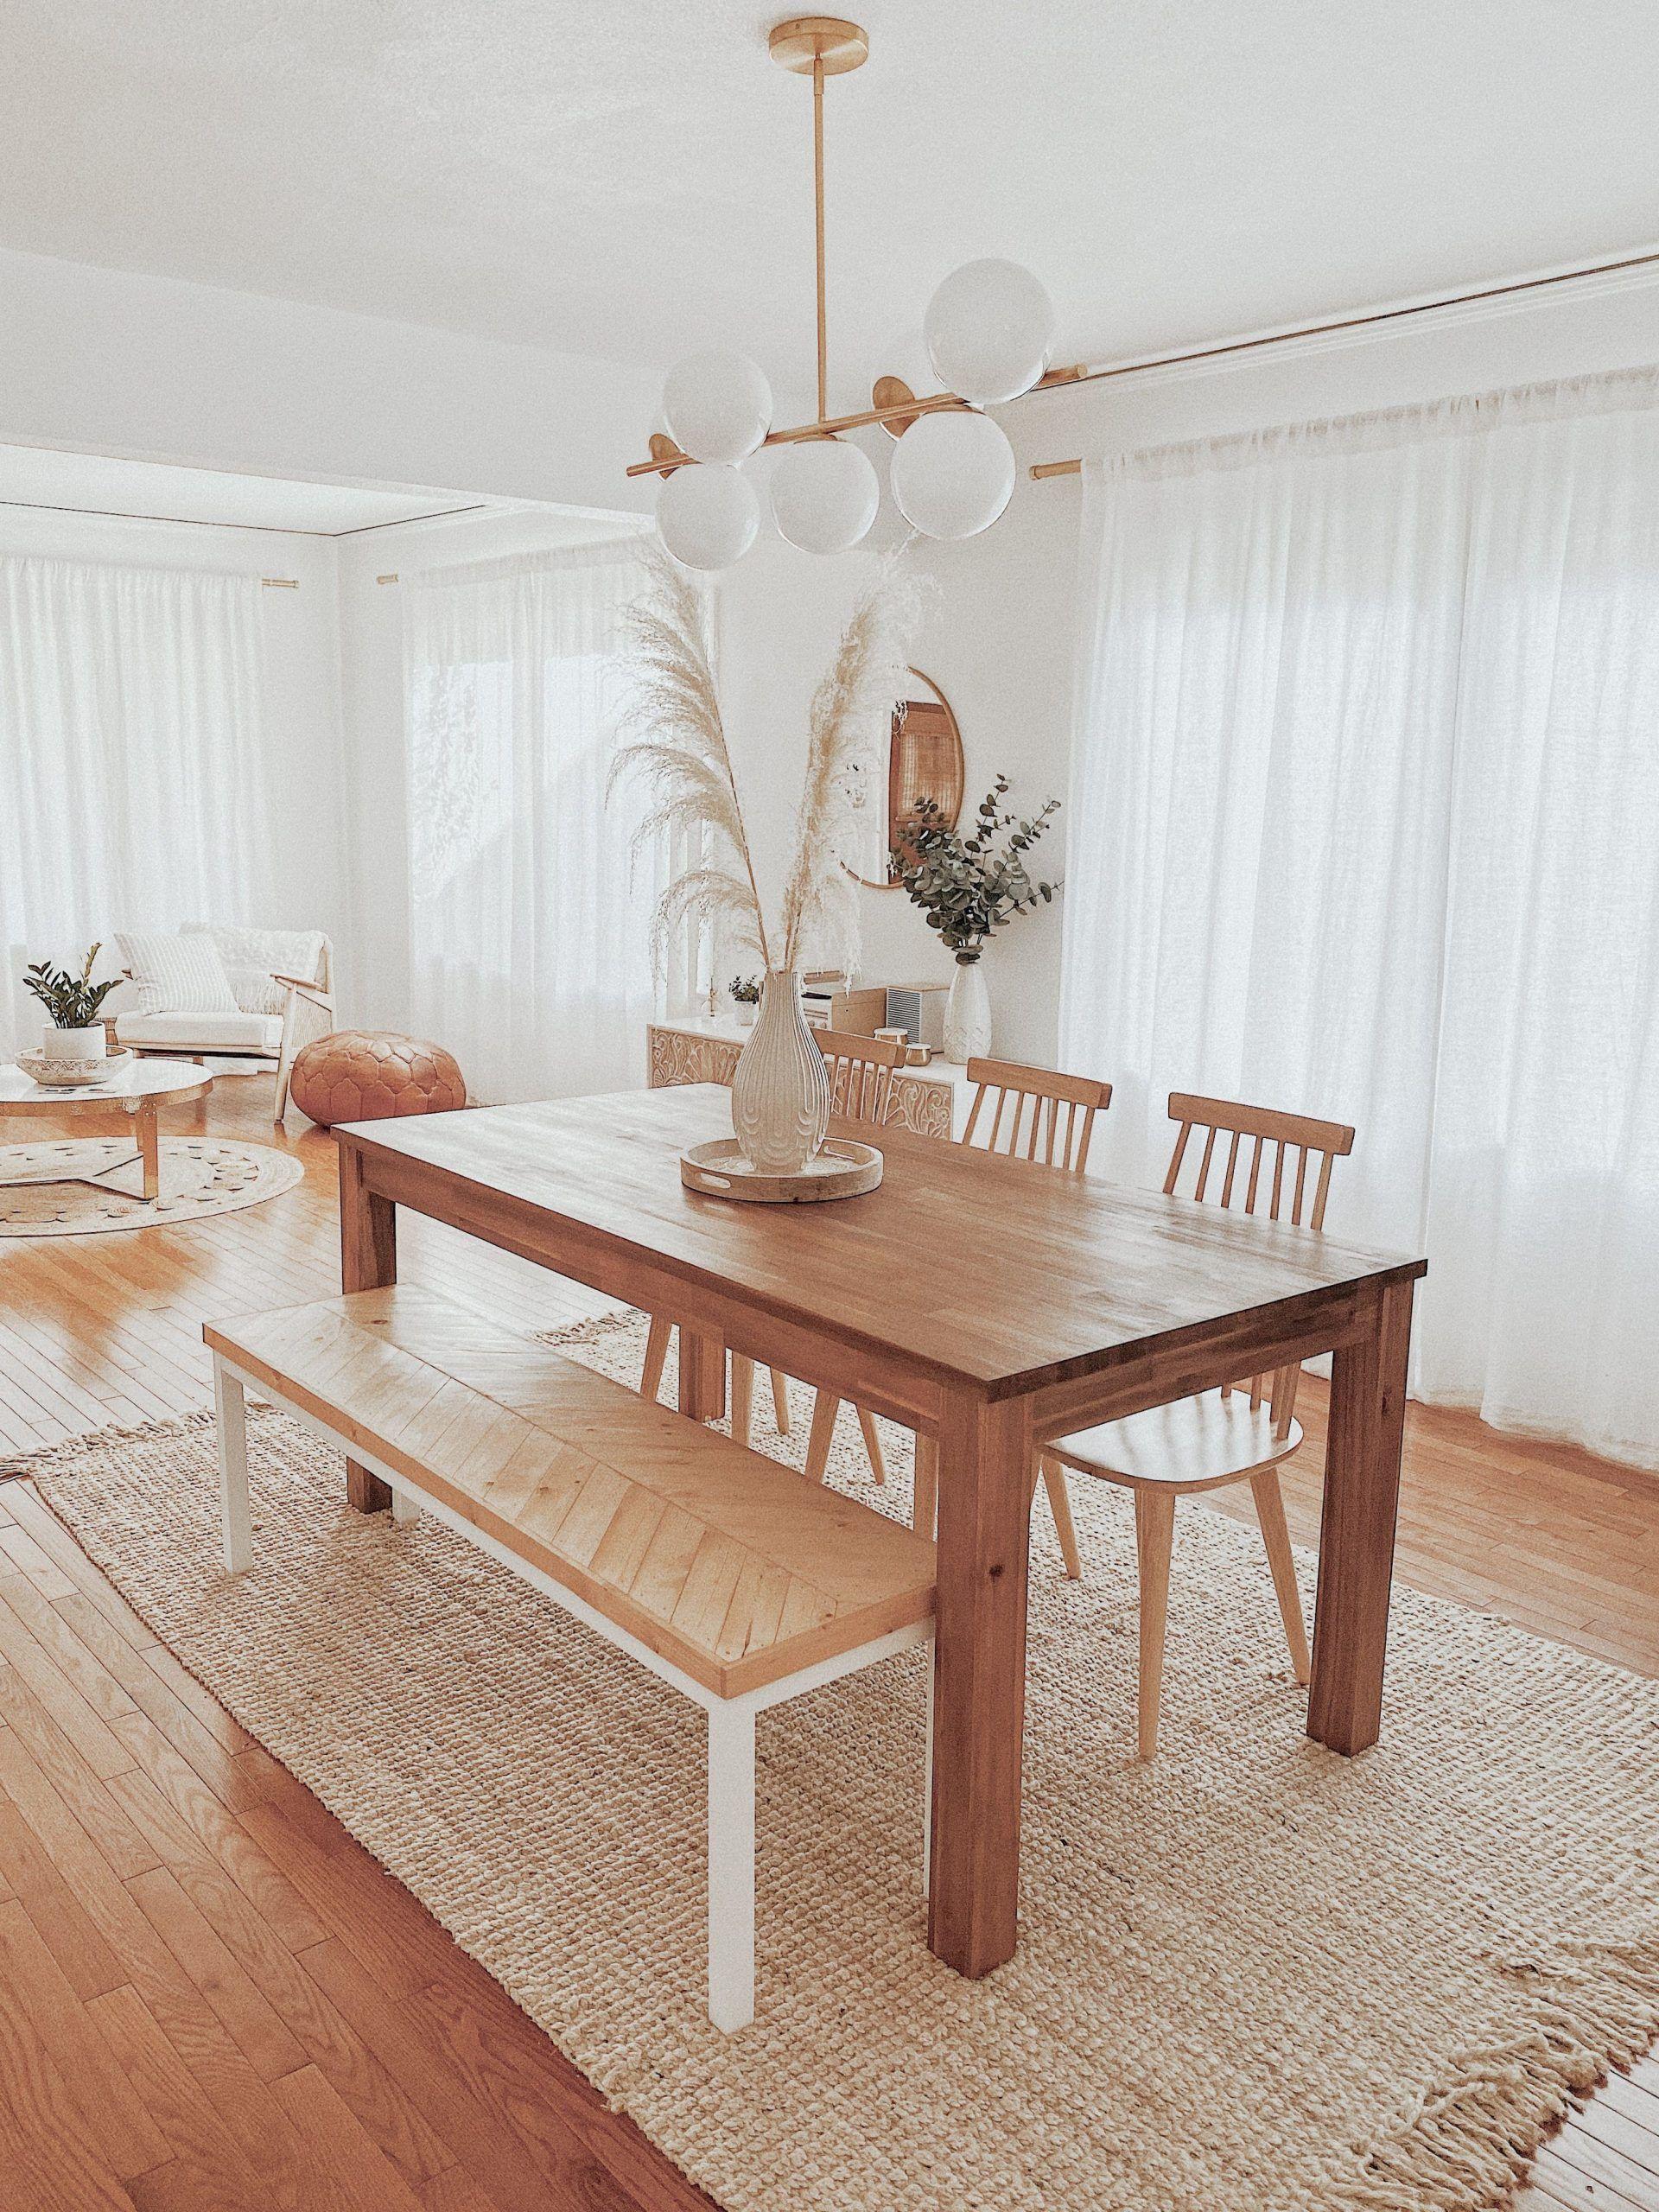 Boho Bohemian White Wood Cozy Dining Room Living Space Home Decor Interior Ideas Inspo Bohemian Boho Coz Dining Room Cozy Boho Dining Room Luxury Dining Room